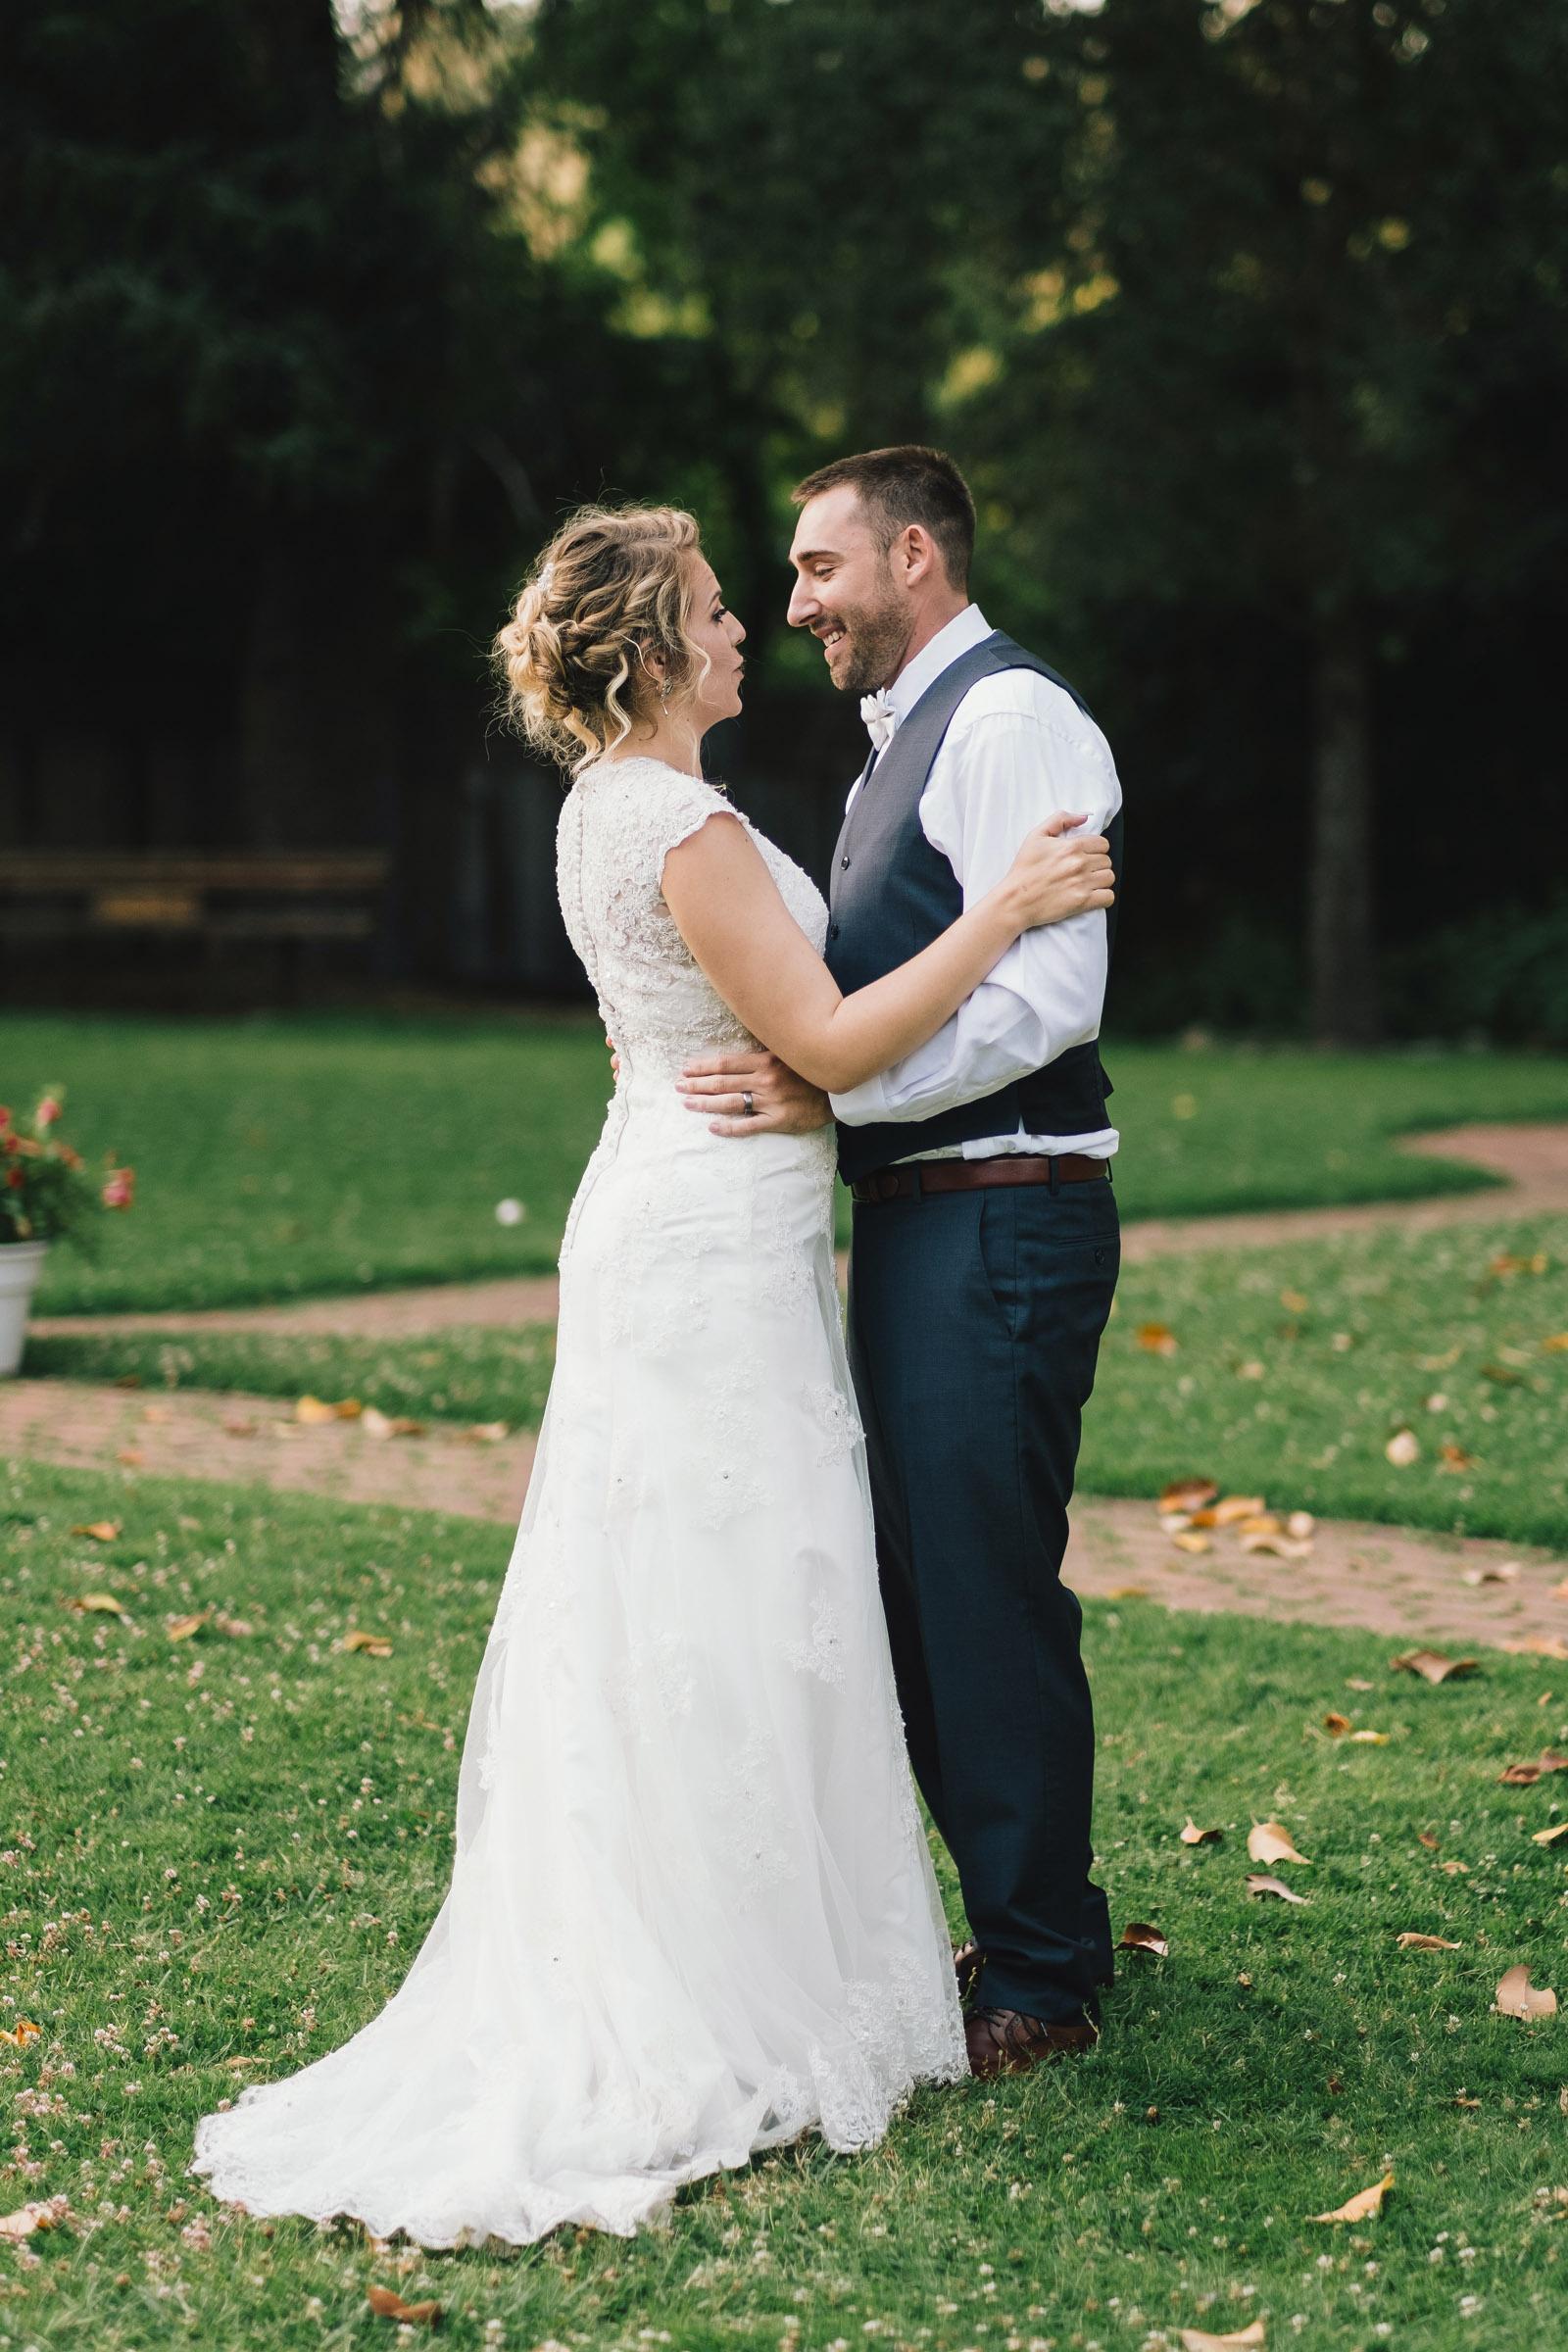 6-24-17 April and Josh Wedding-147.jpg